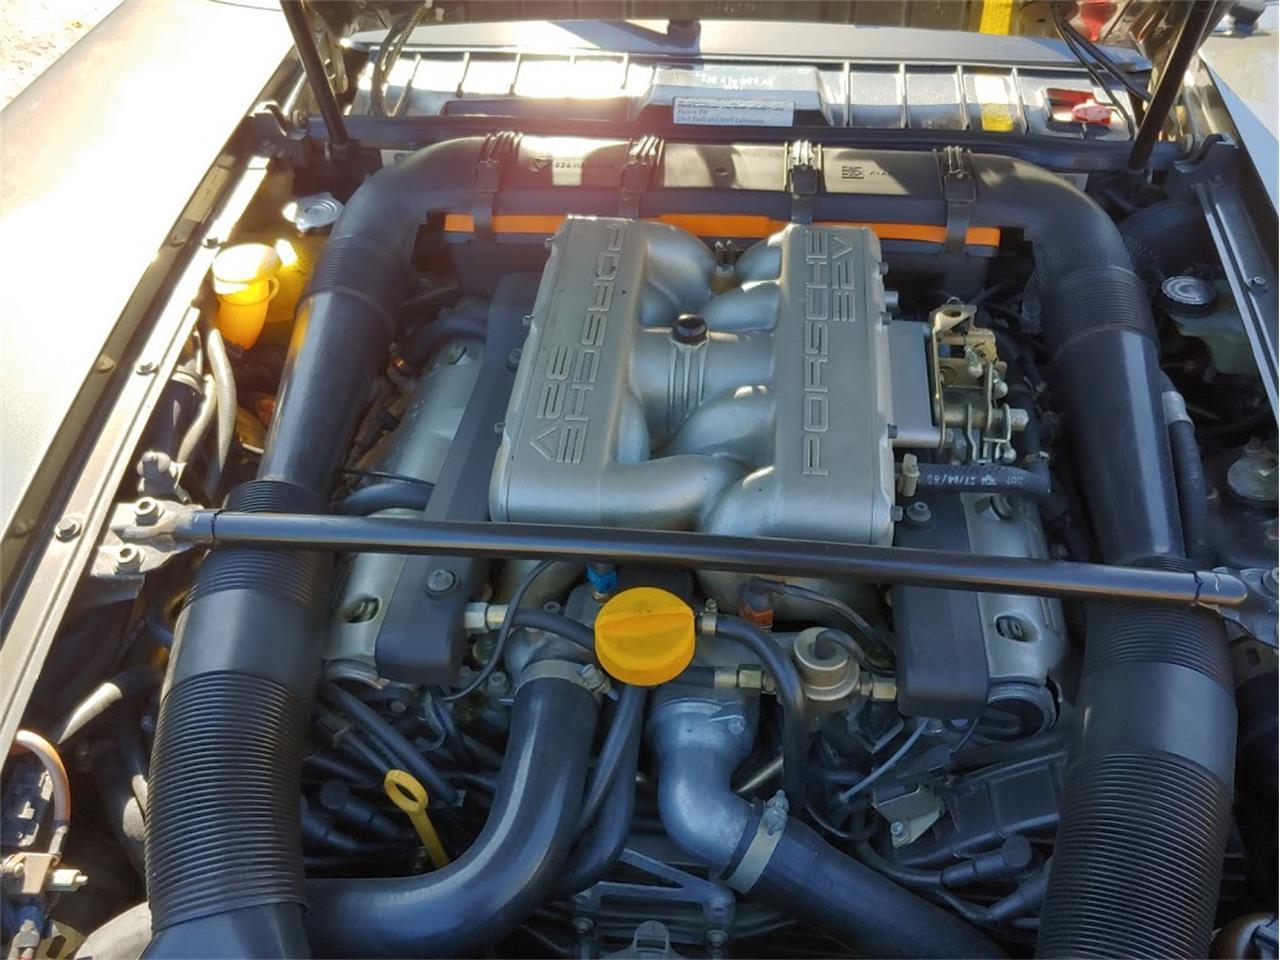 Large Picture of '91 Porsche 928 located in Richmond Illinois - $24,999.00 - QW14